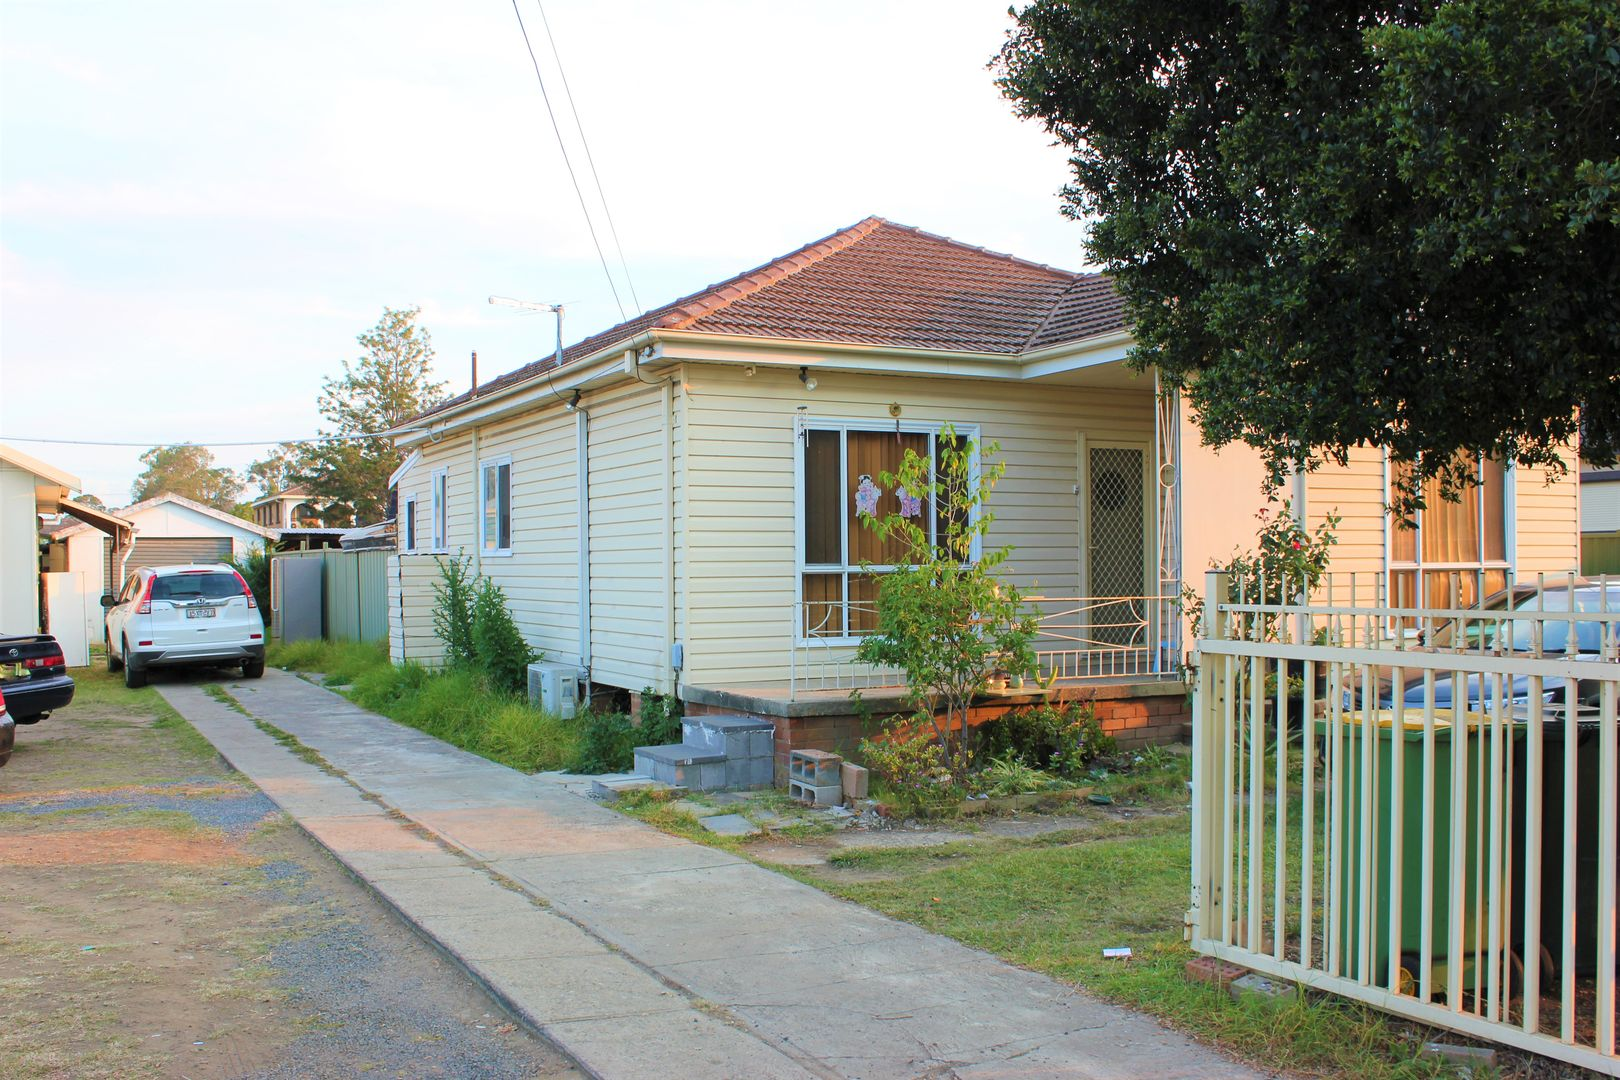 62 ST JOHNS ROAD, Cabramatta NSW 2166, Image 1